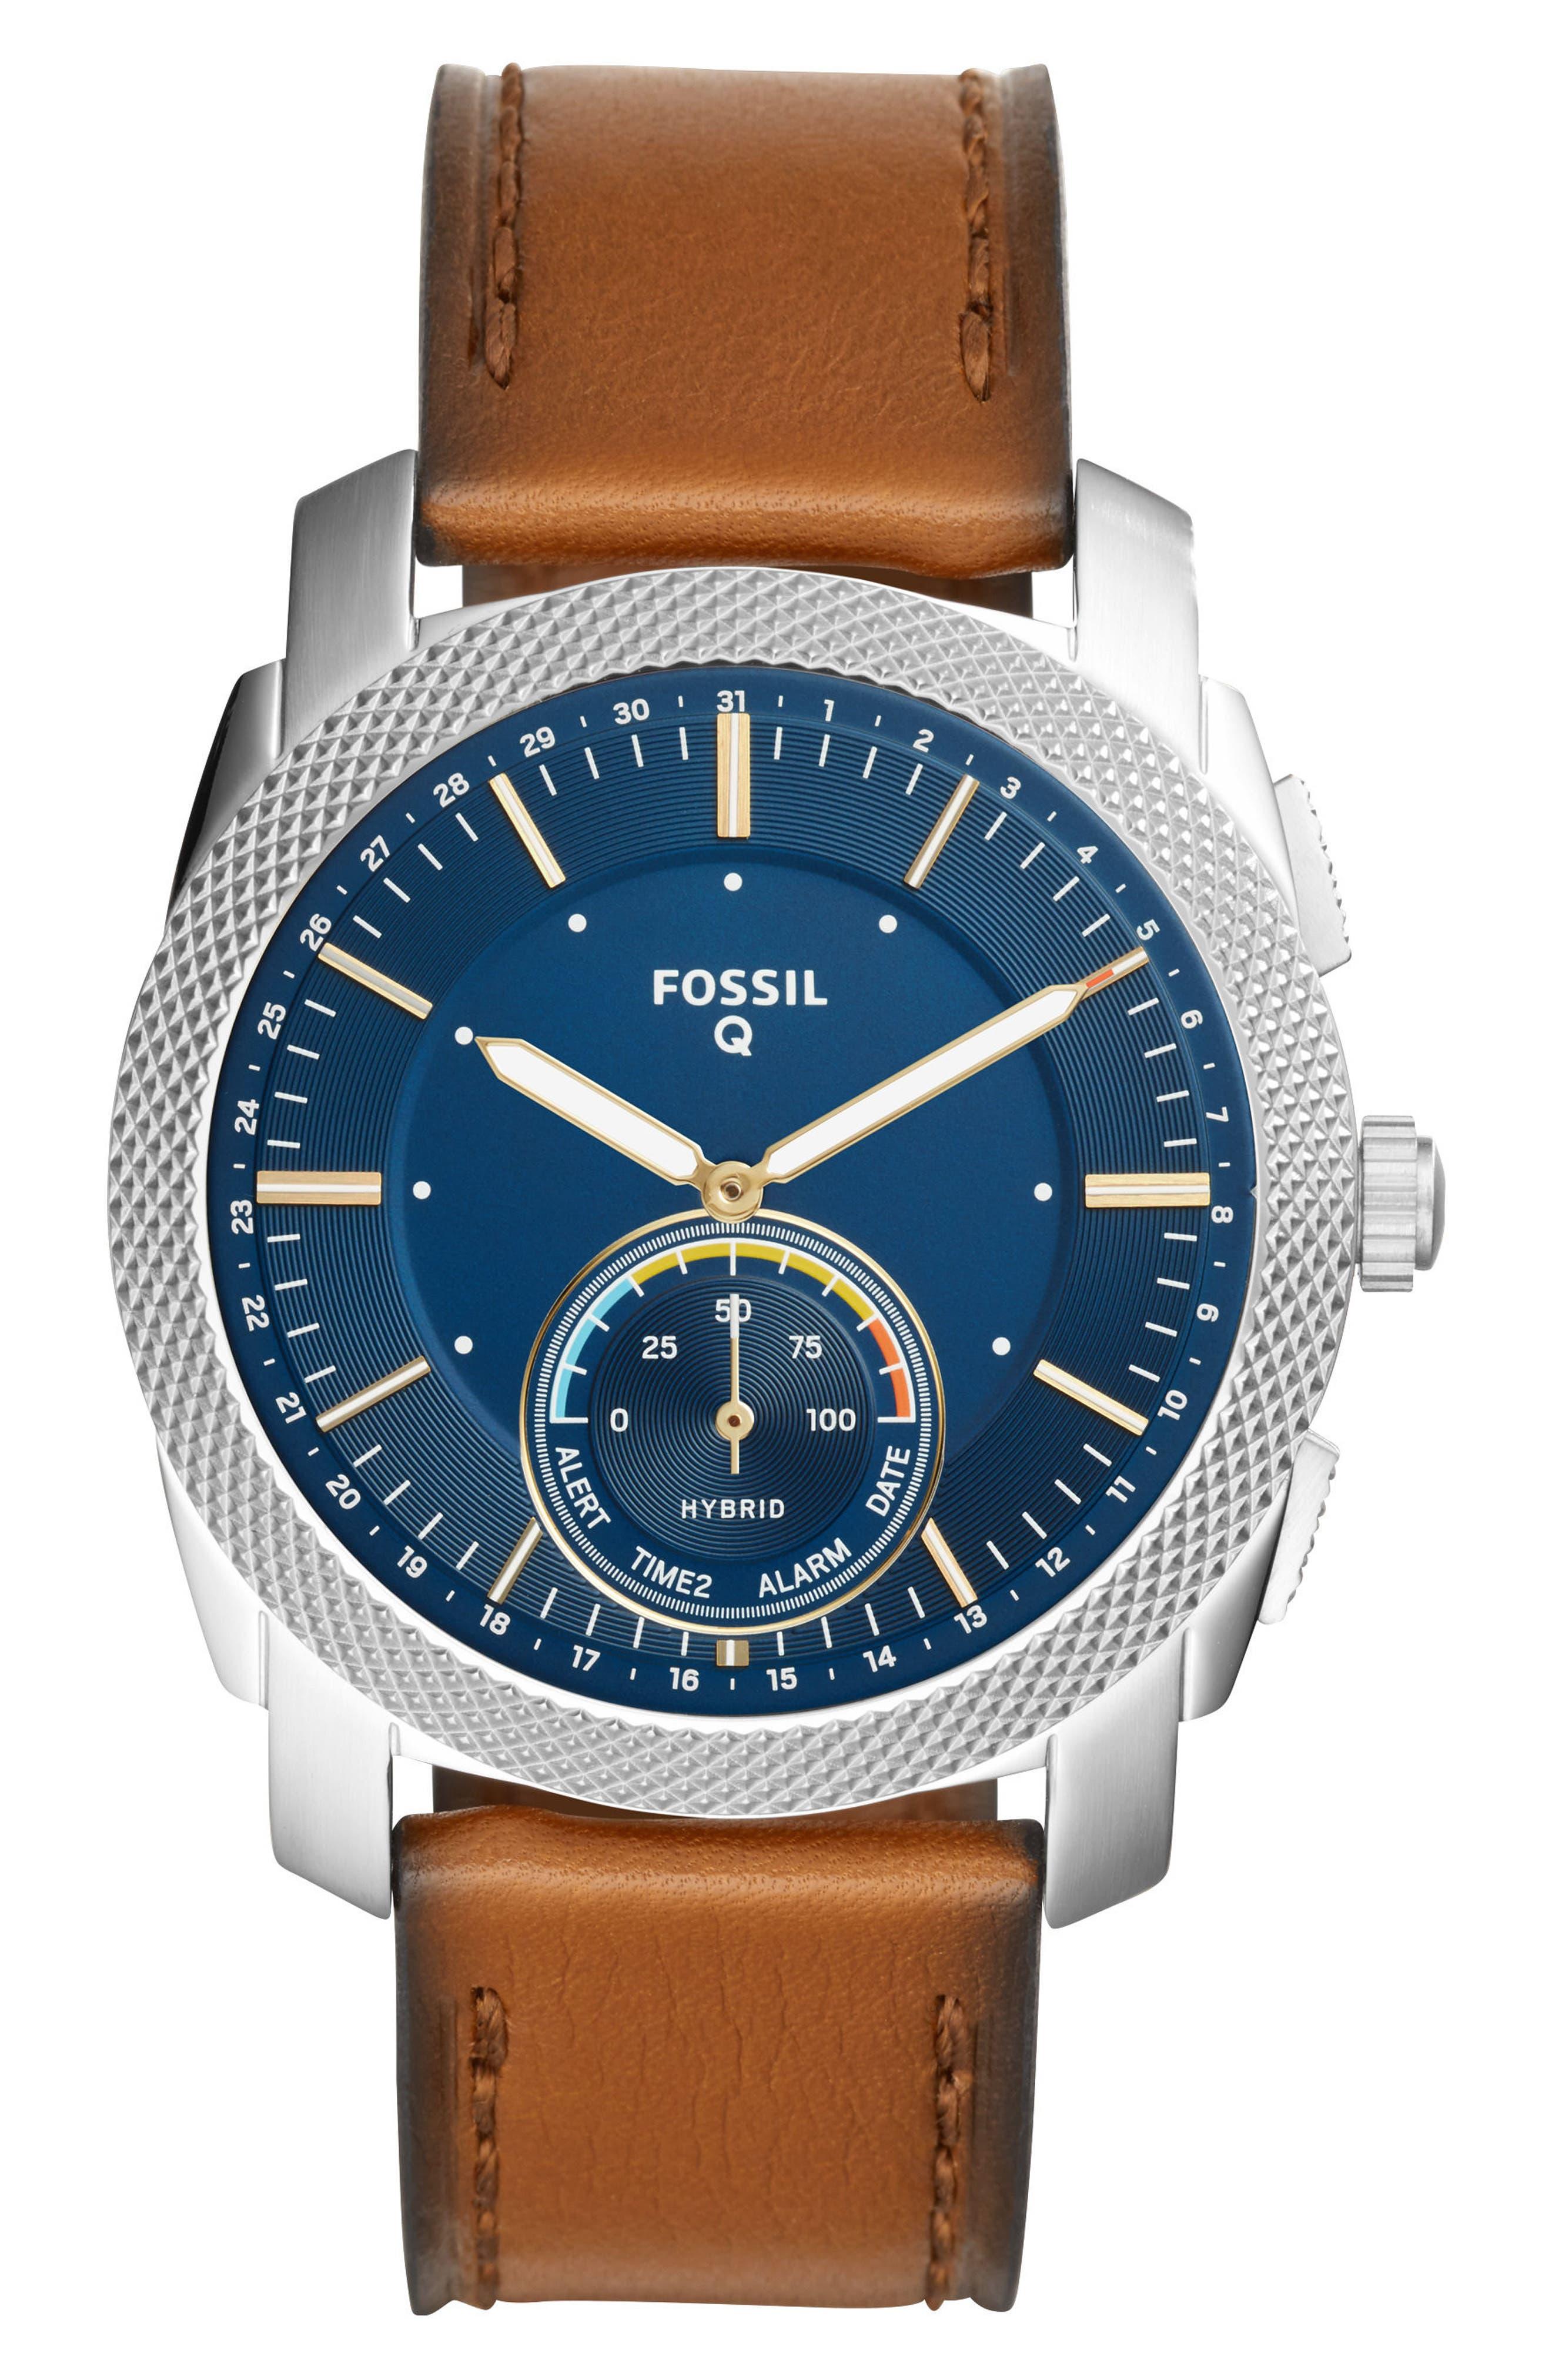 Main Image - Fossil Q Machine Leather Strap Hybrid Smart Watch, 45mm